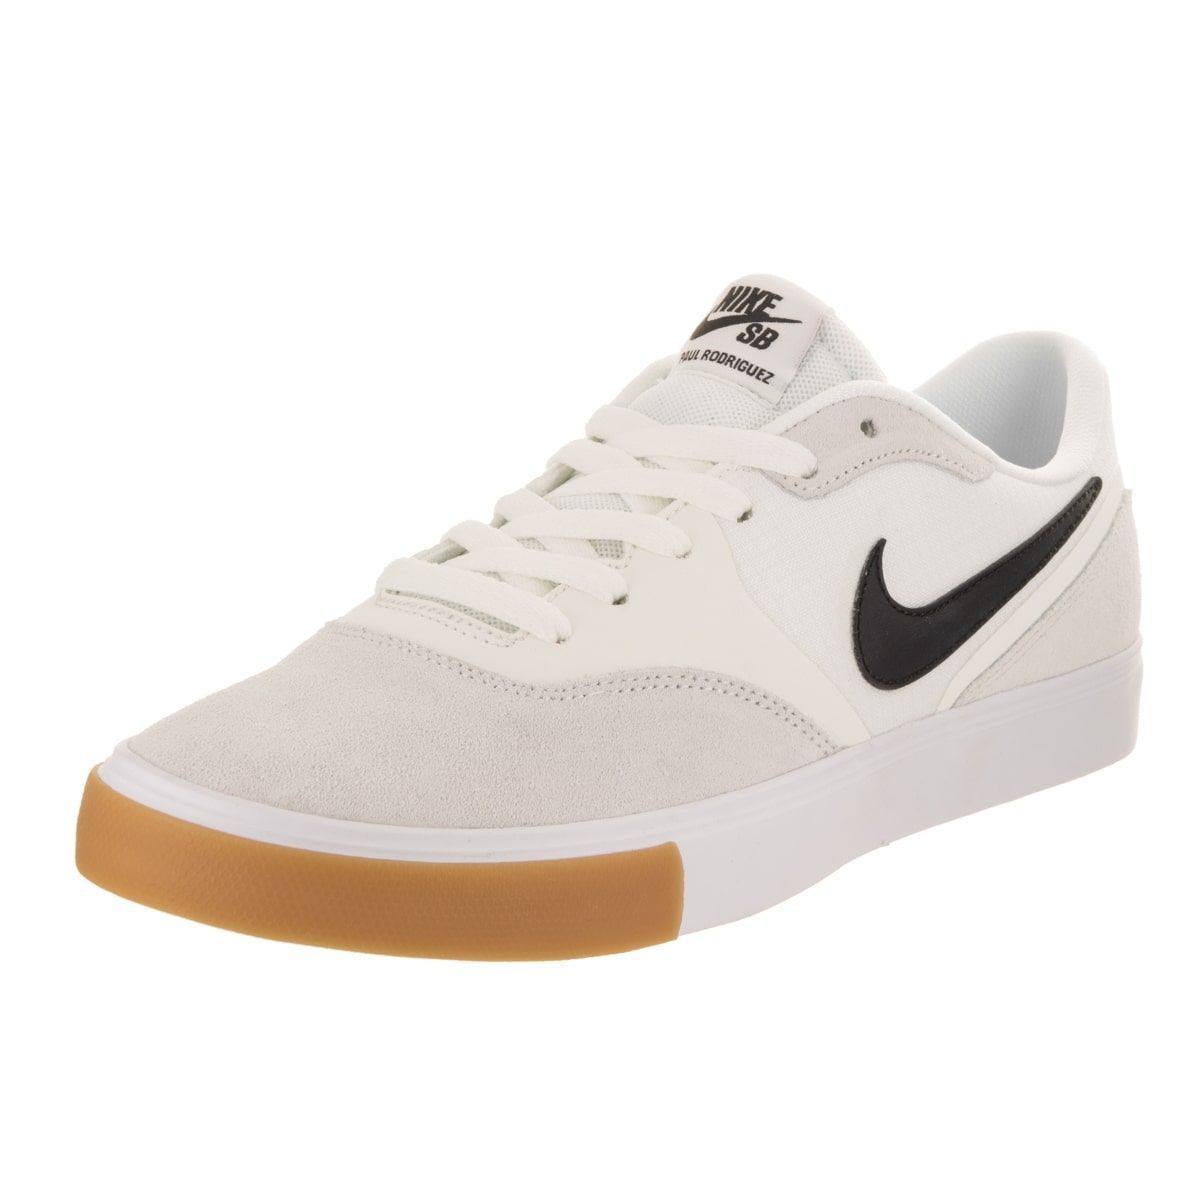 dd1339b5057912 Nike Men s Paul Rodriguez 9 VR Skate Shoe